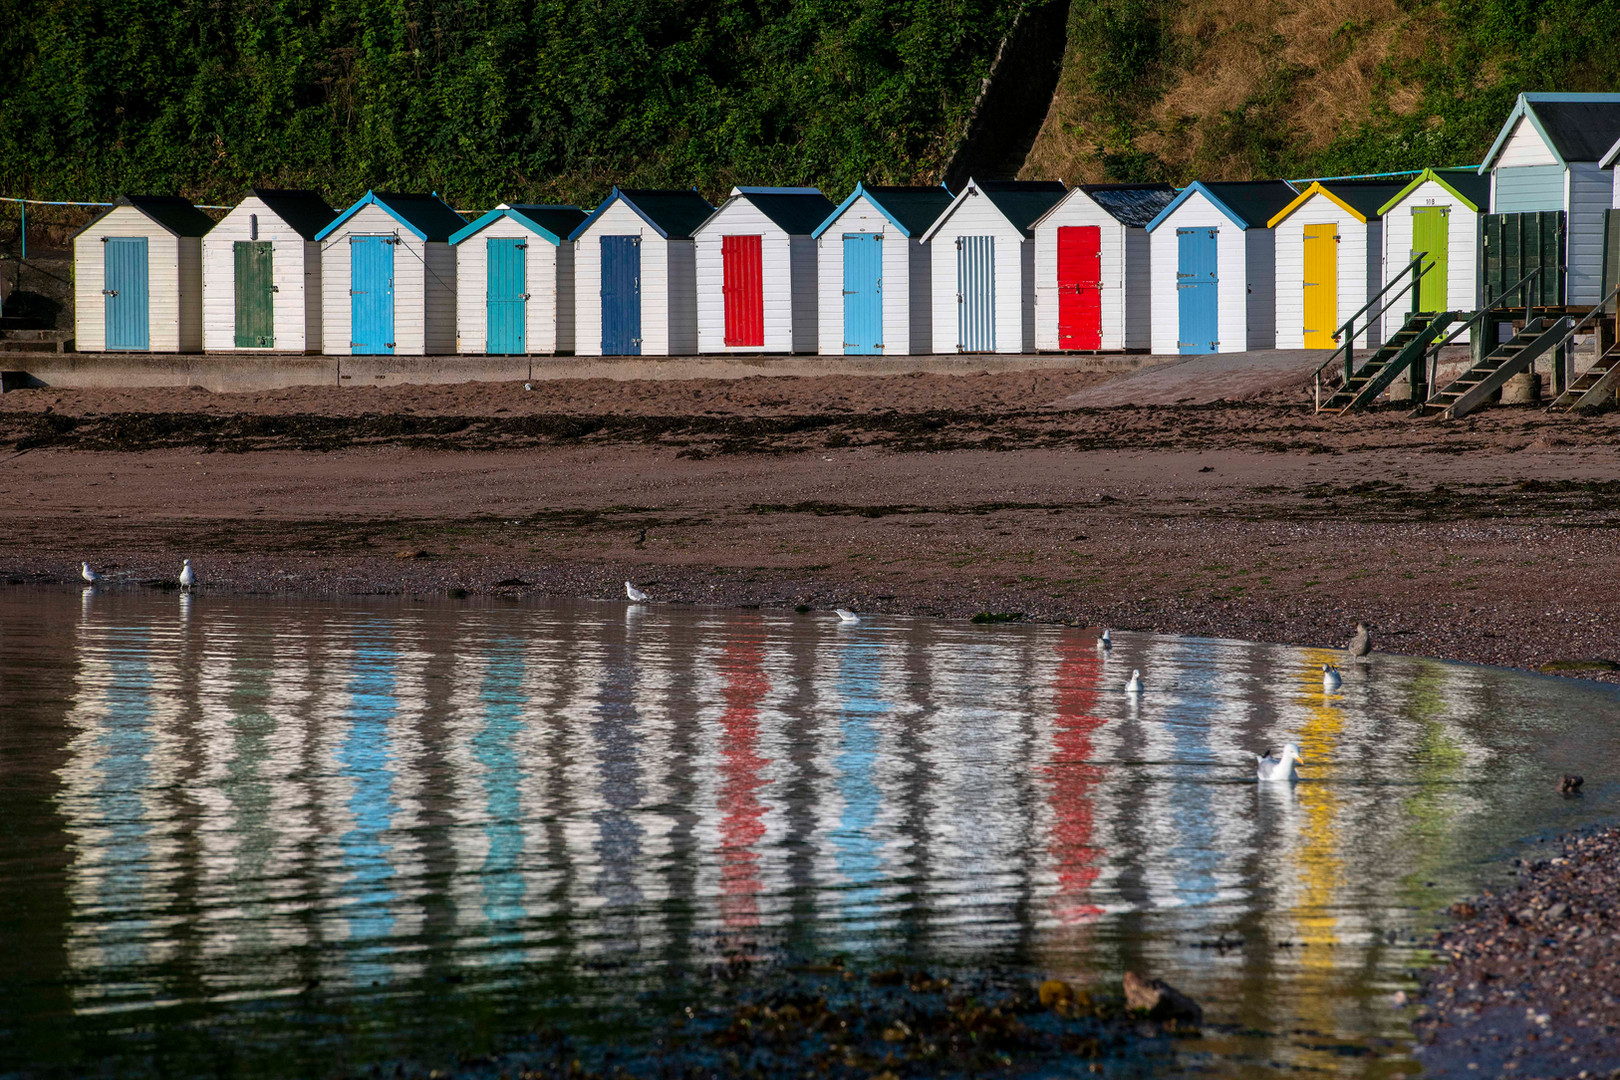 Beahc huts in Devon